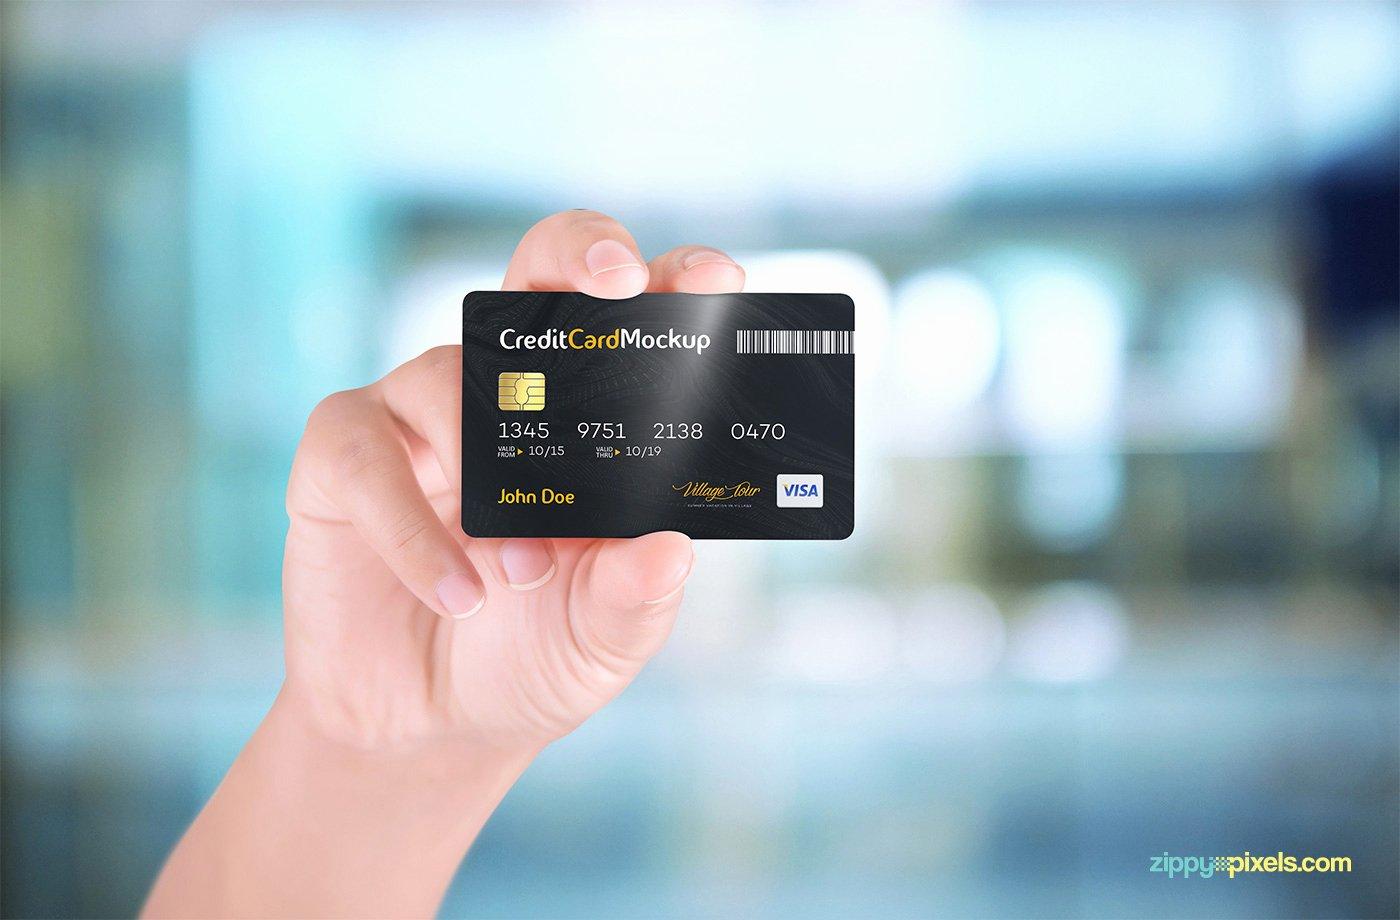 Credit Card Mockup Psd Beautiful 40 Excellent Credit Card Psd Mockup Templates